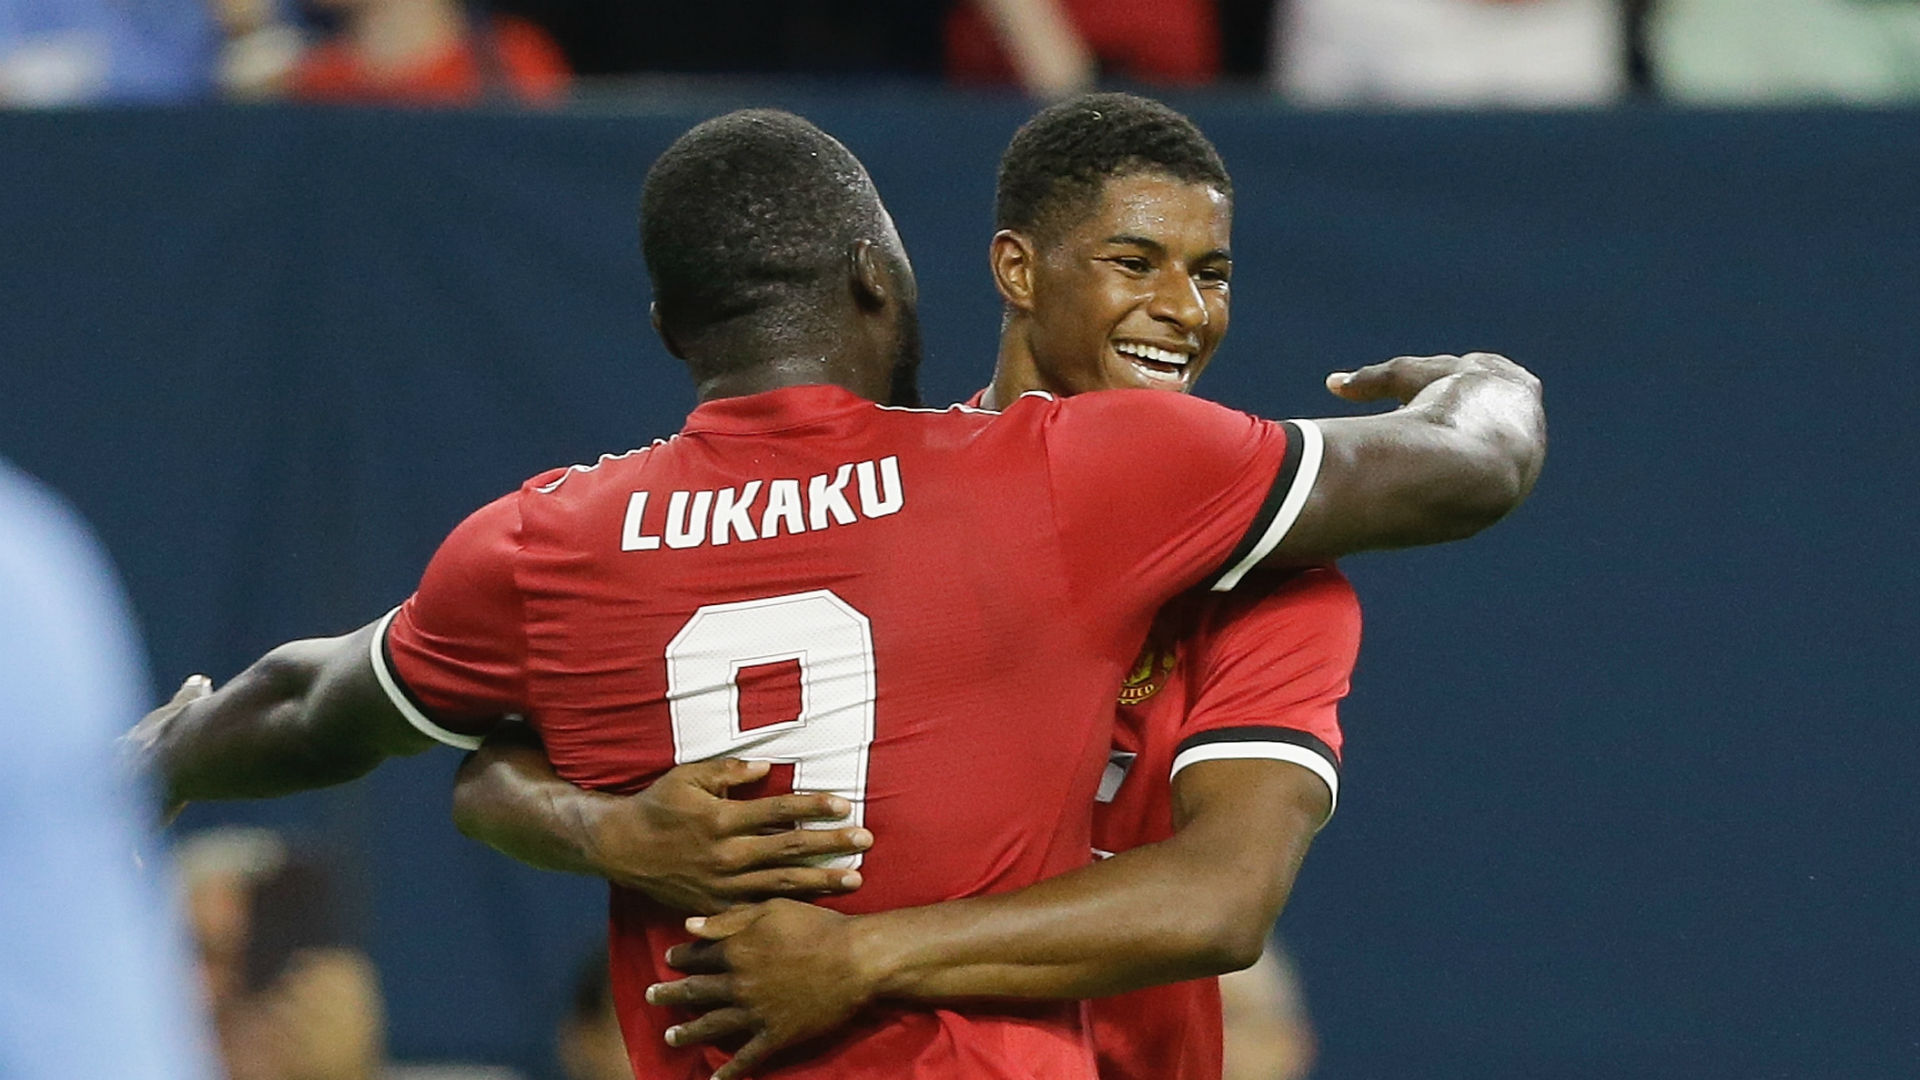 Marcus Rashford Romel Lukaku Manchester United ICC